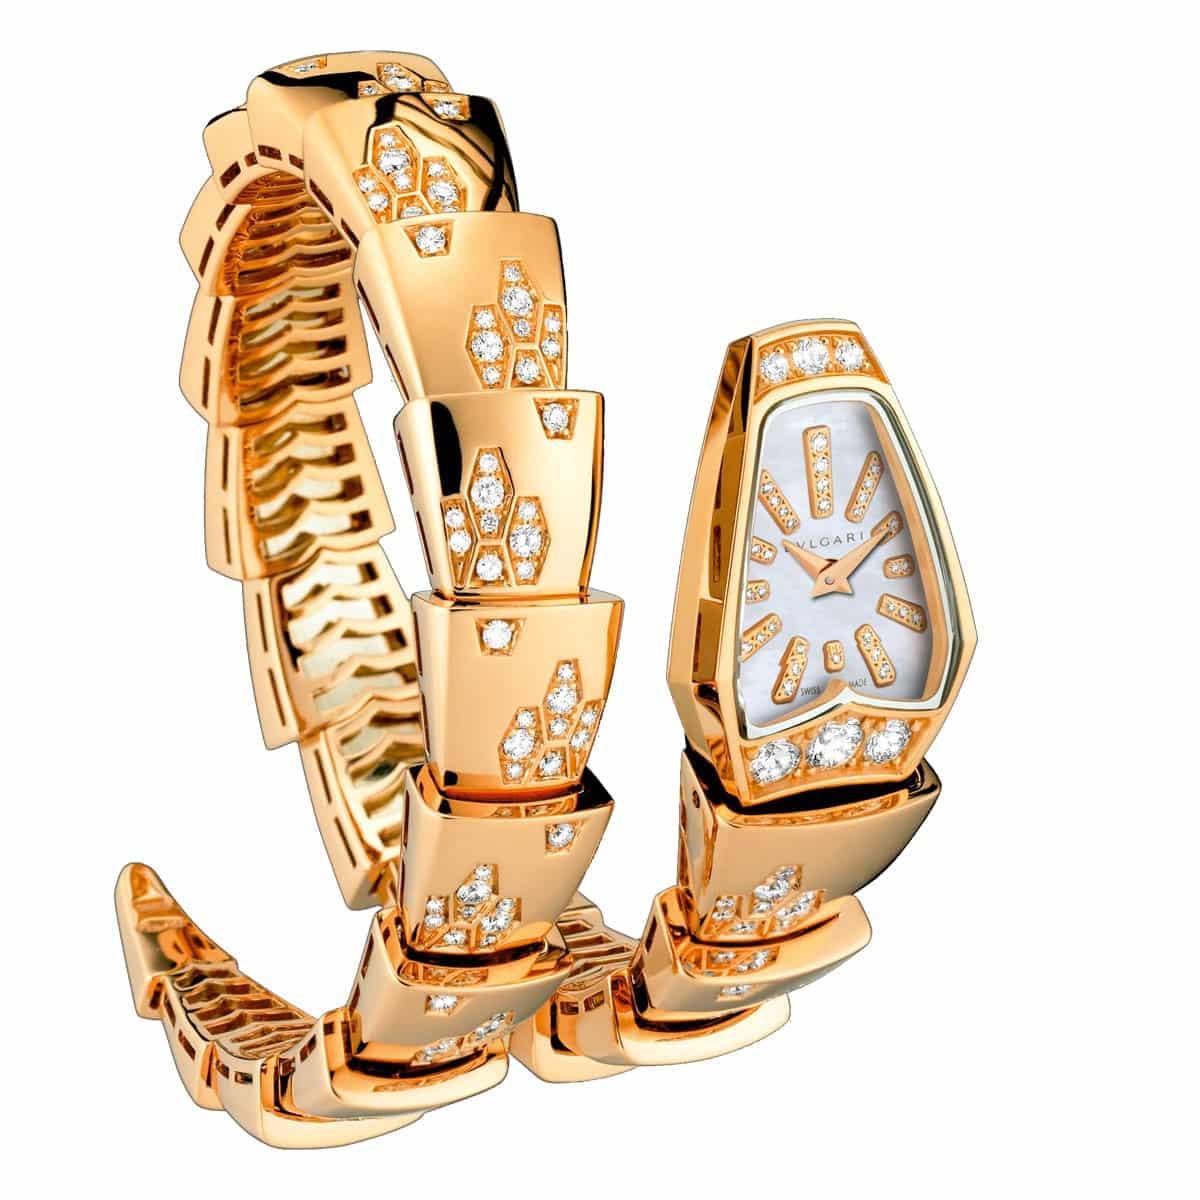 8c1550b31b6a Bulgari Serpenti Jewelery - Lionel Meylan